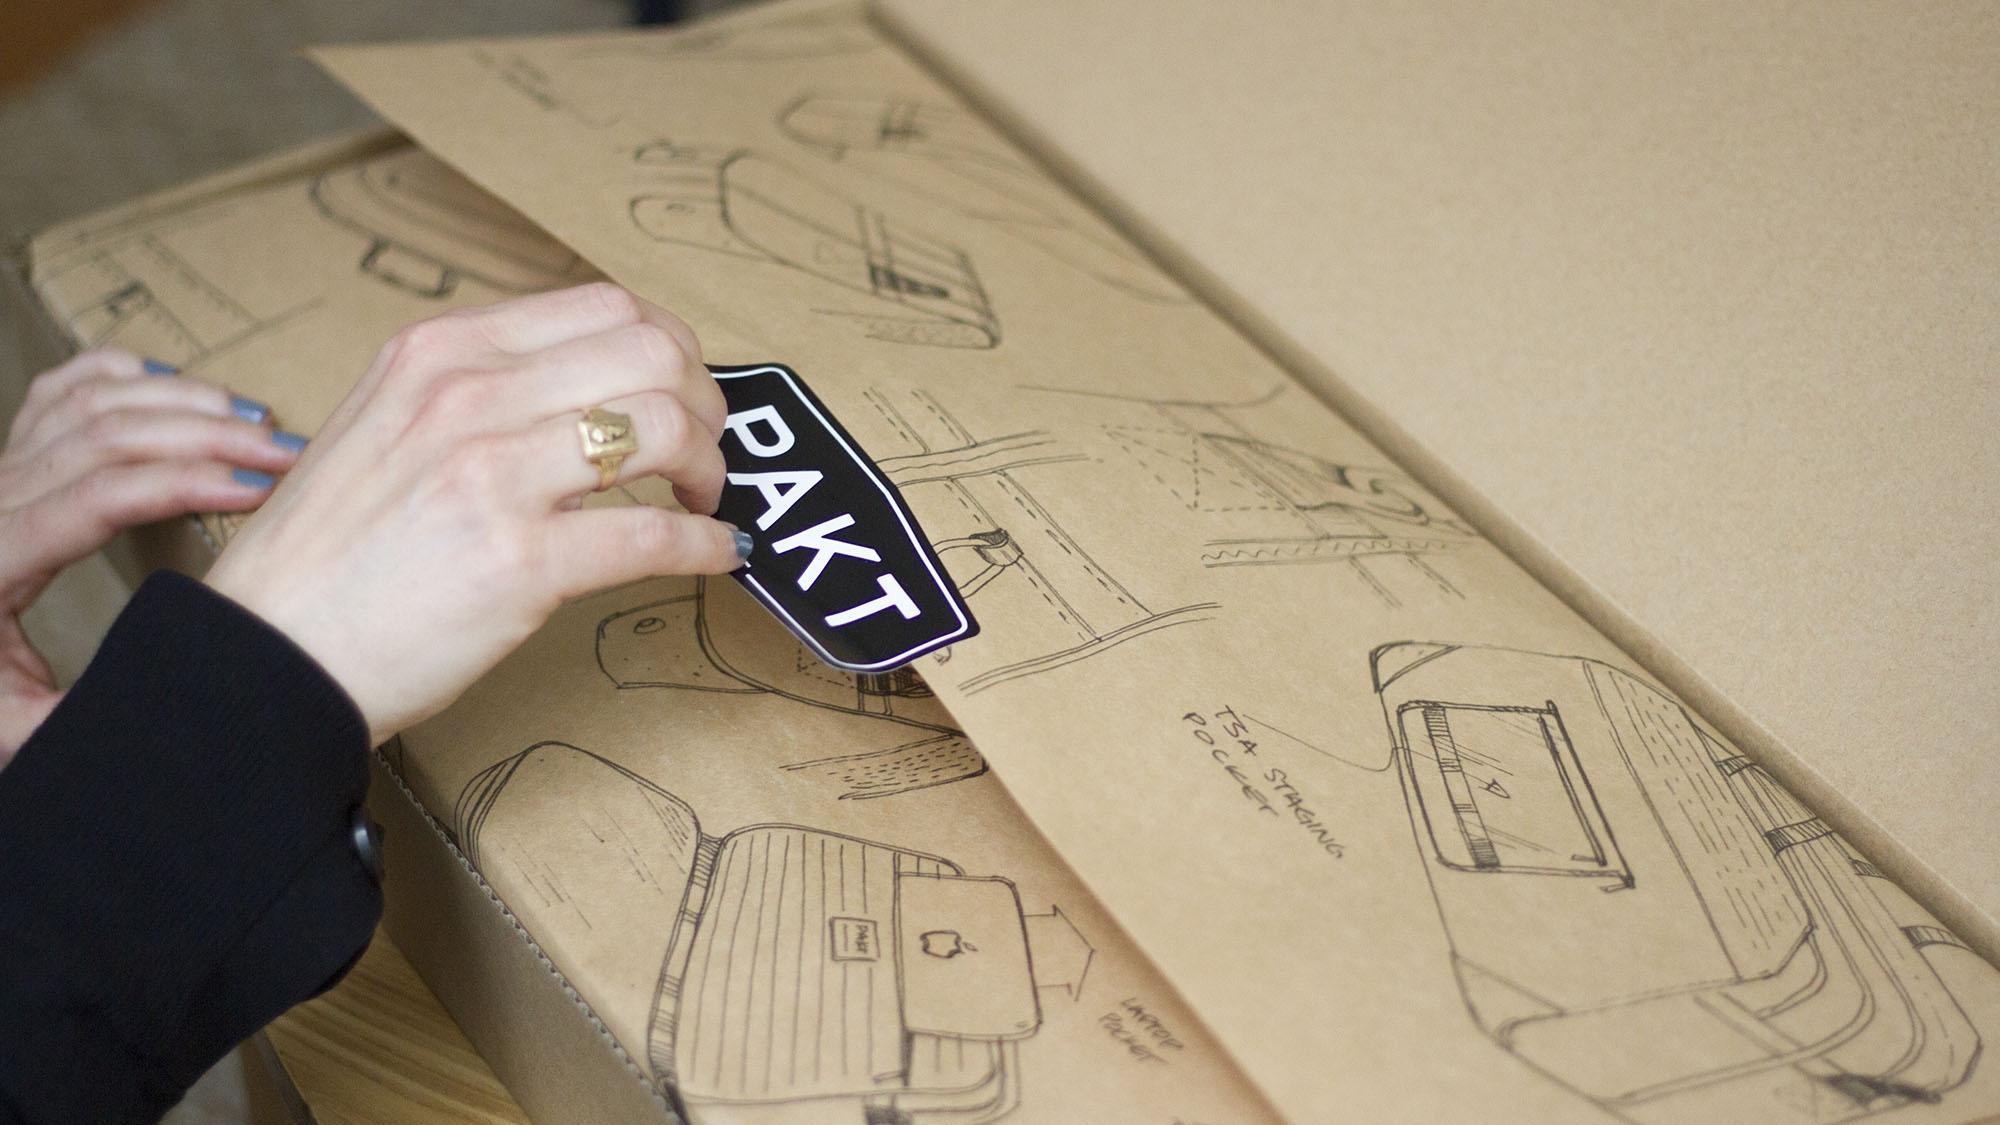 Pakt_Final Packaging_8385.jpg